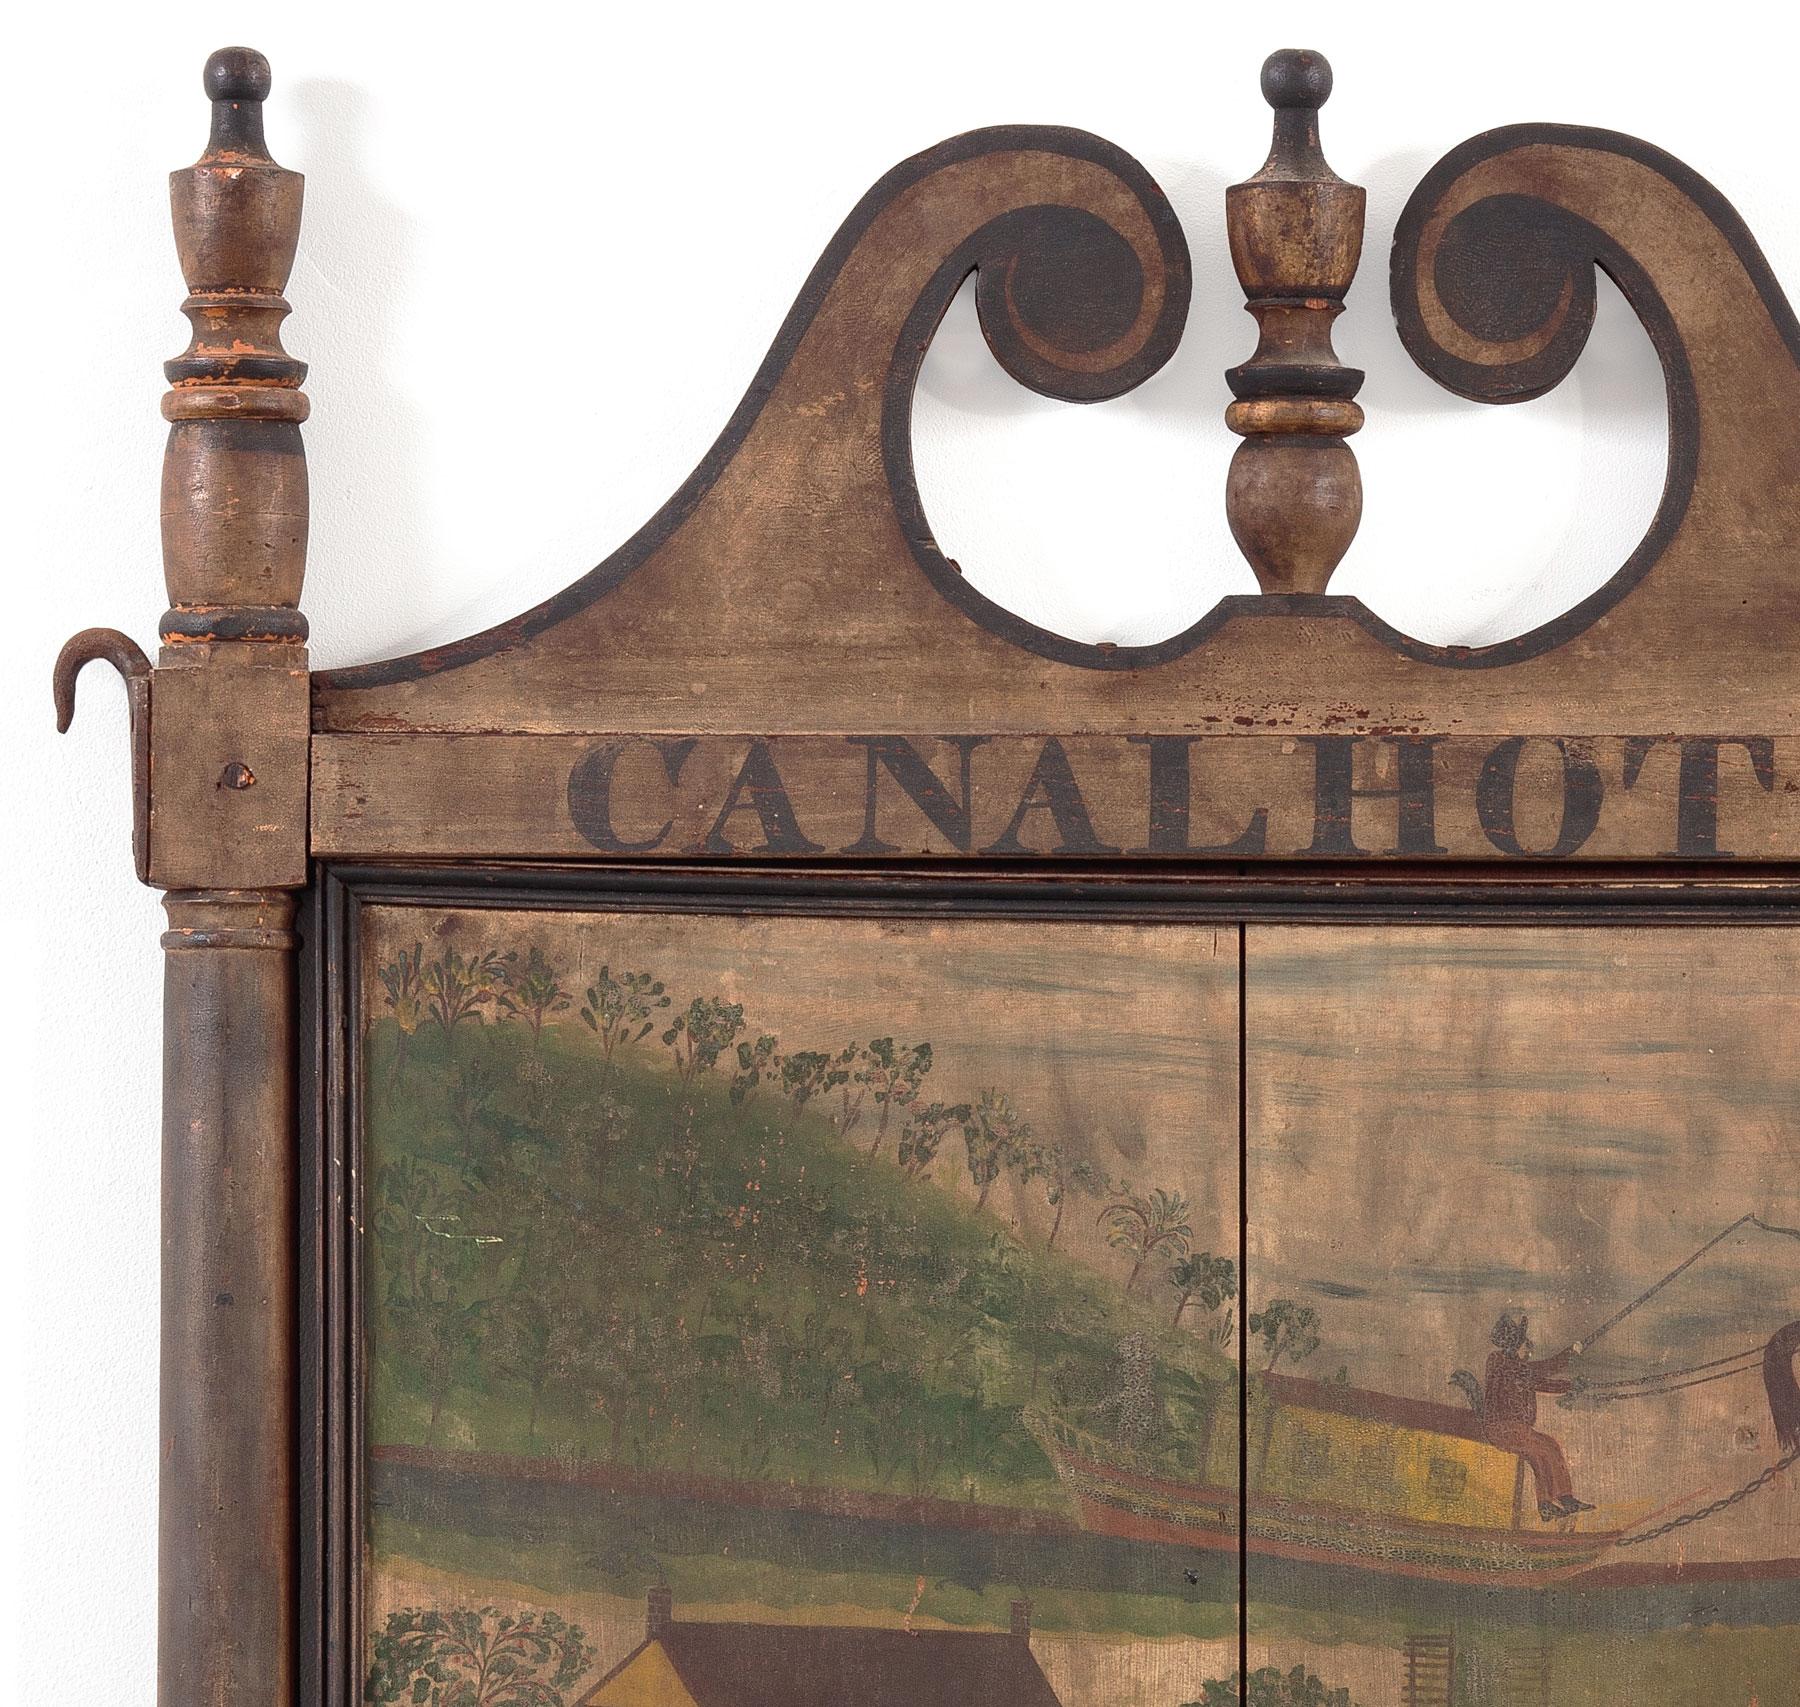 Sign for the <em>Canal Hotel</em>, detail of urn shaped finials.